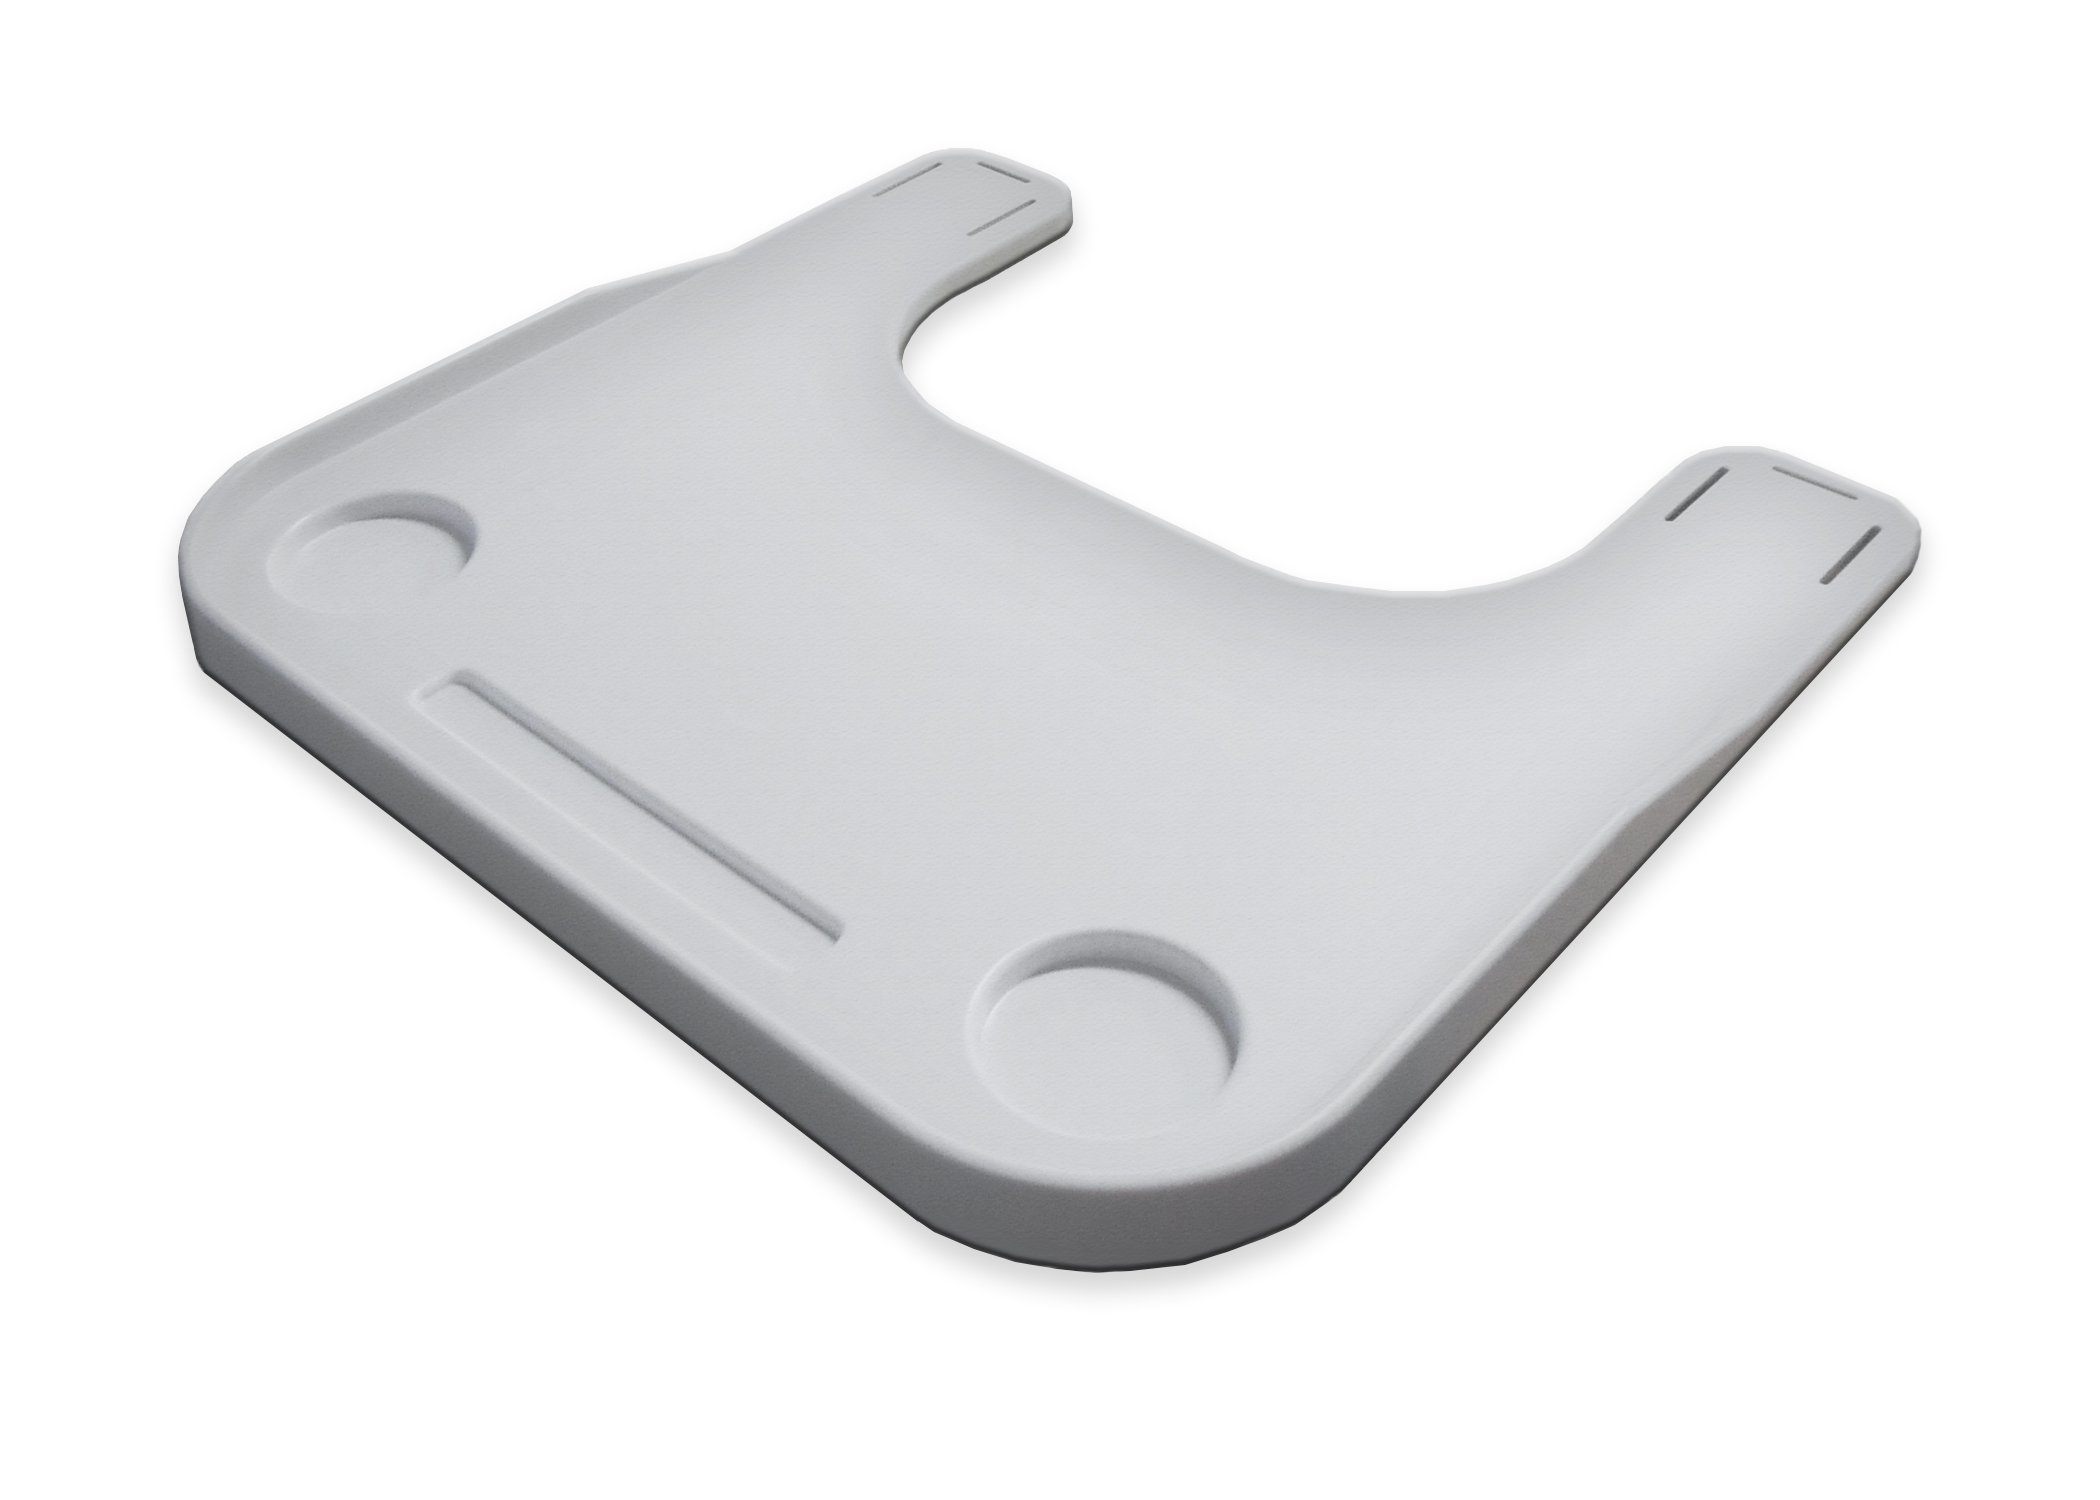 Rehabilitation Advantage Plastic Molded Wheelchair Lap Tray, Speckled Gray